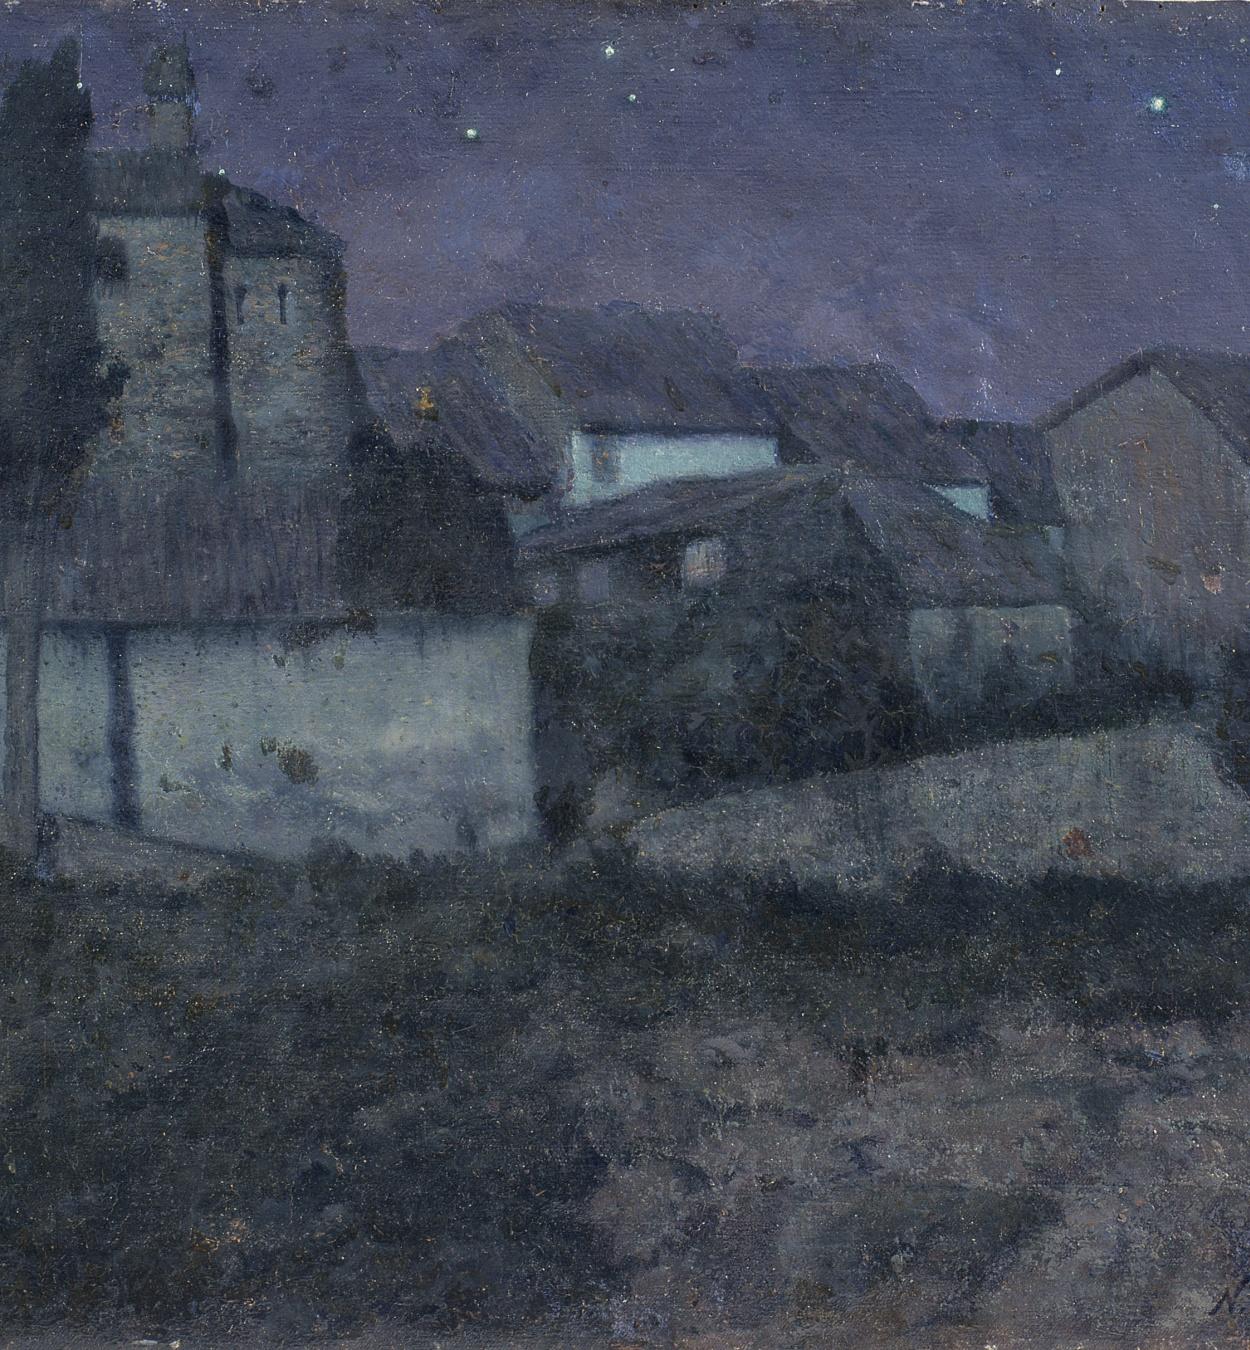 Nicolau Raurich - The Night (Sant Cugat del Vallès) - Circa 1906